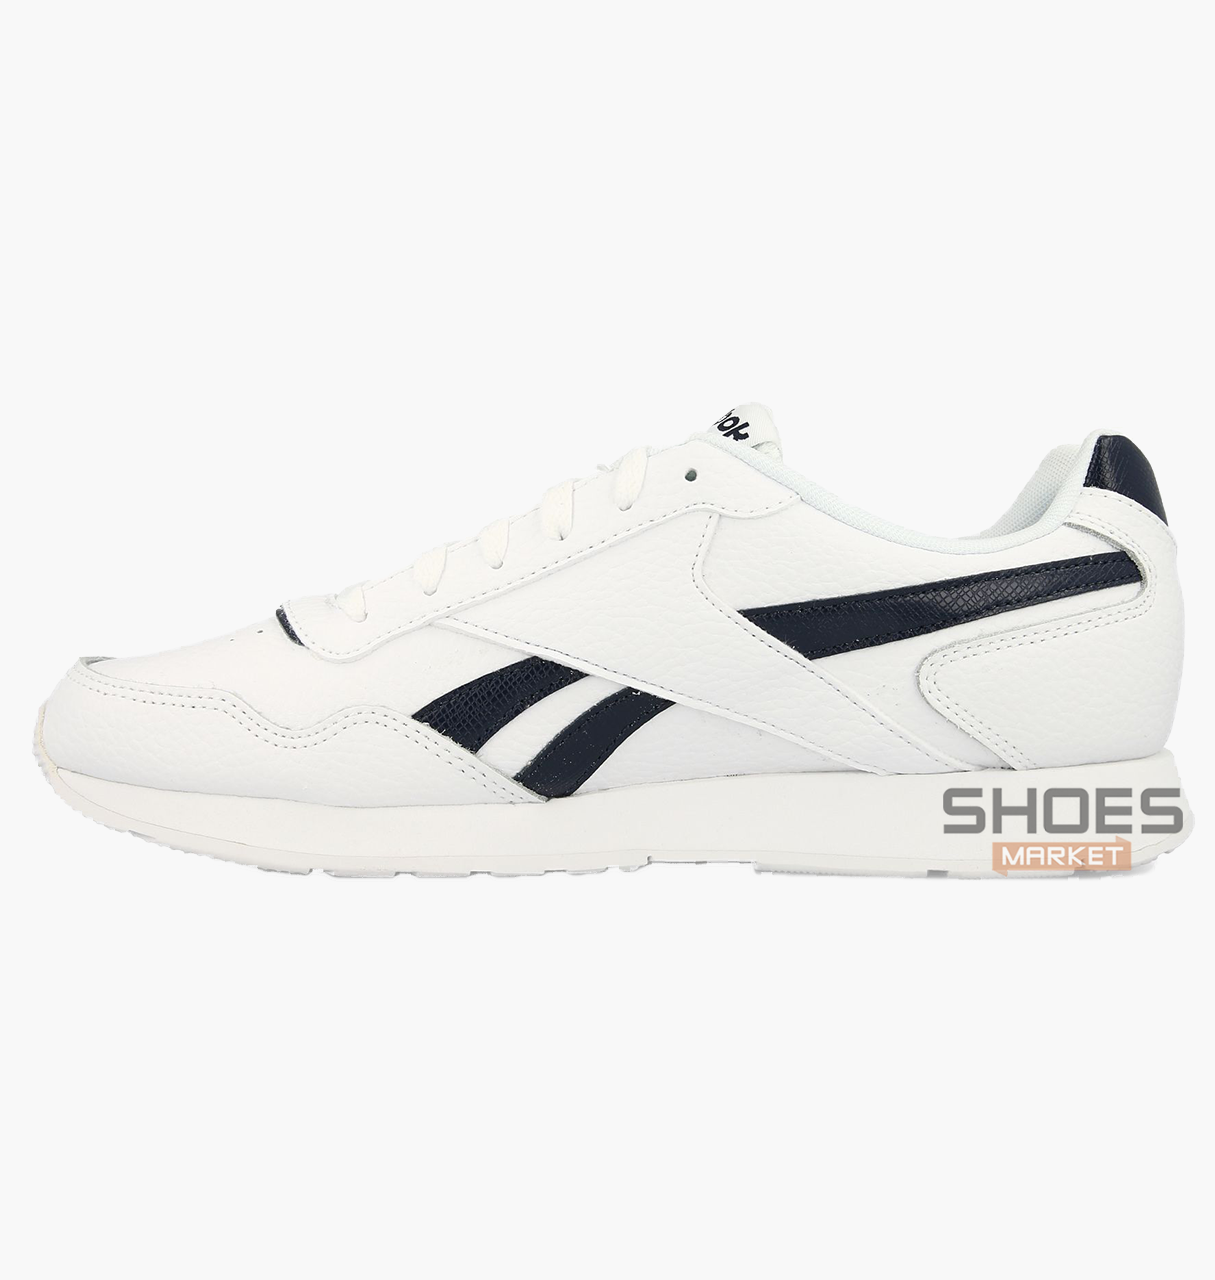 Мужские кроссовки Reebok Royal Glide White CN4560, оригинал